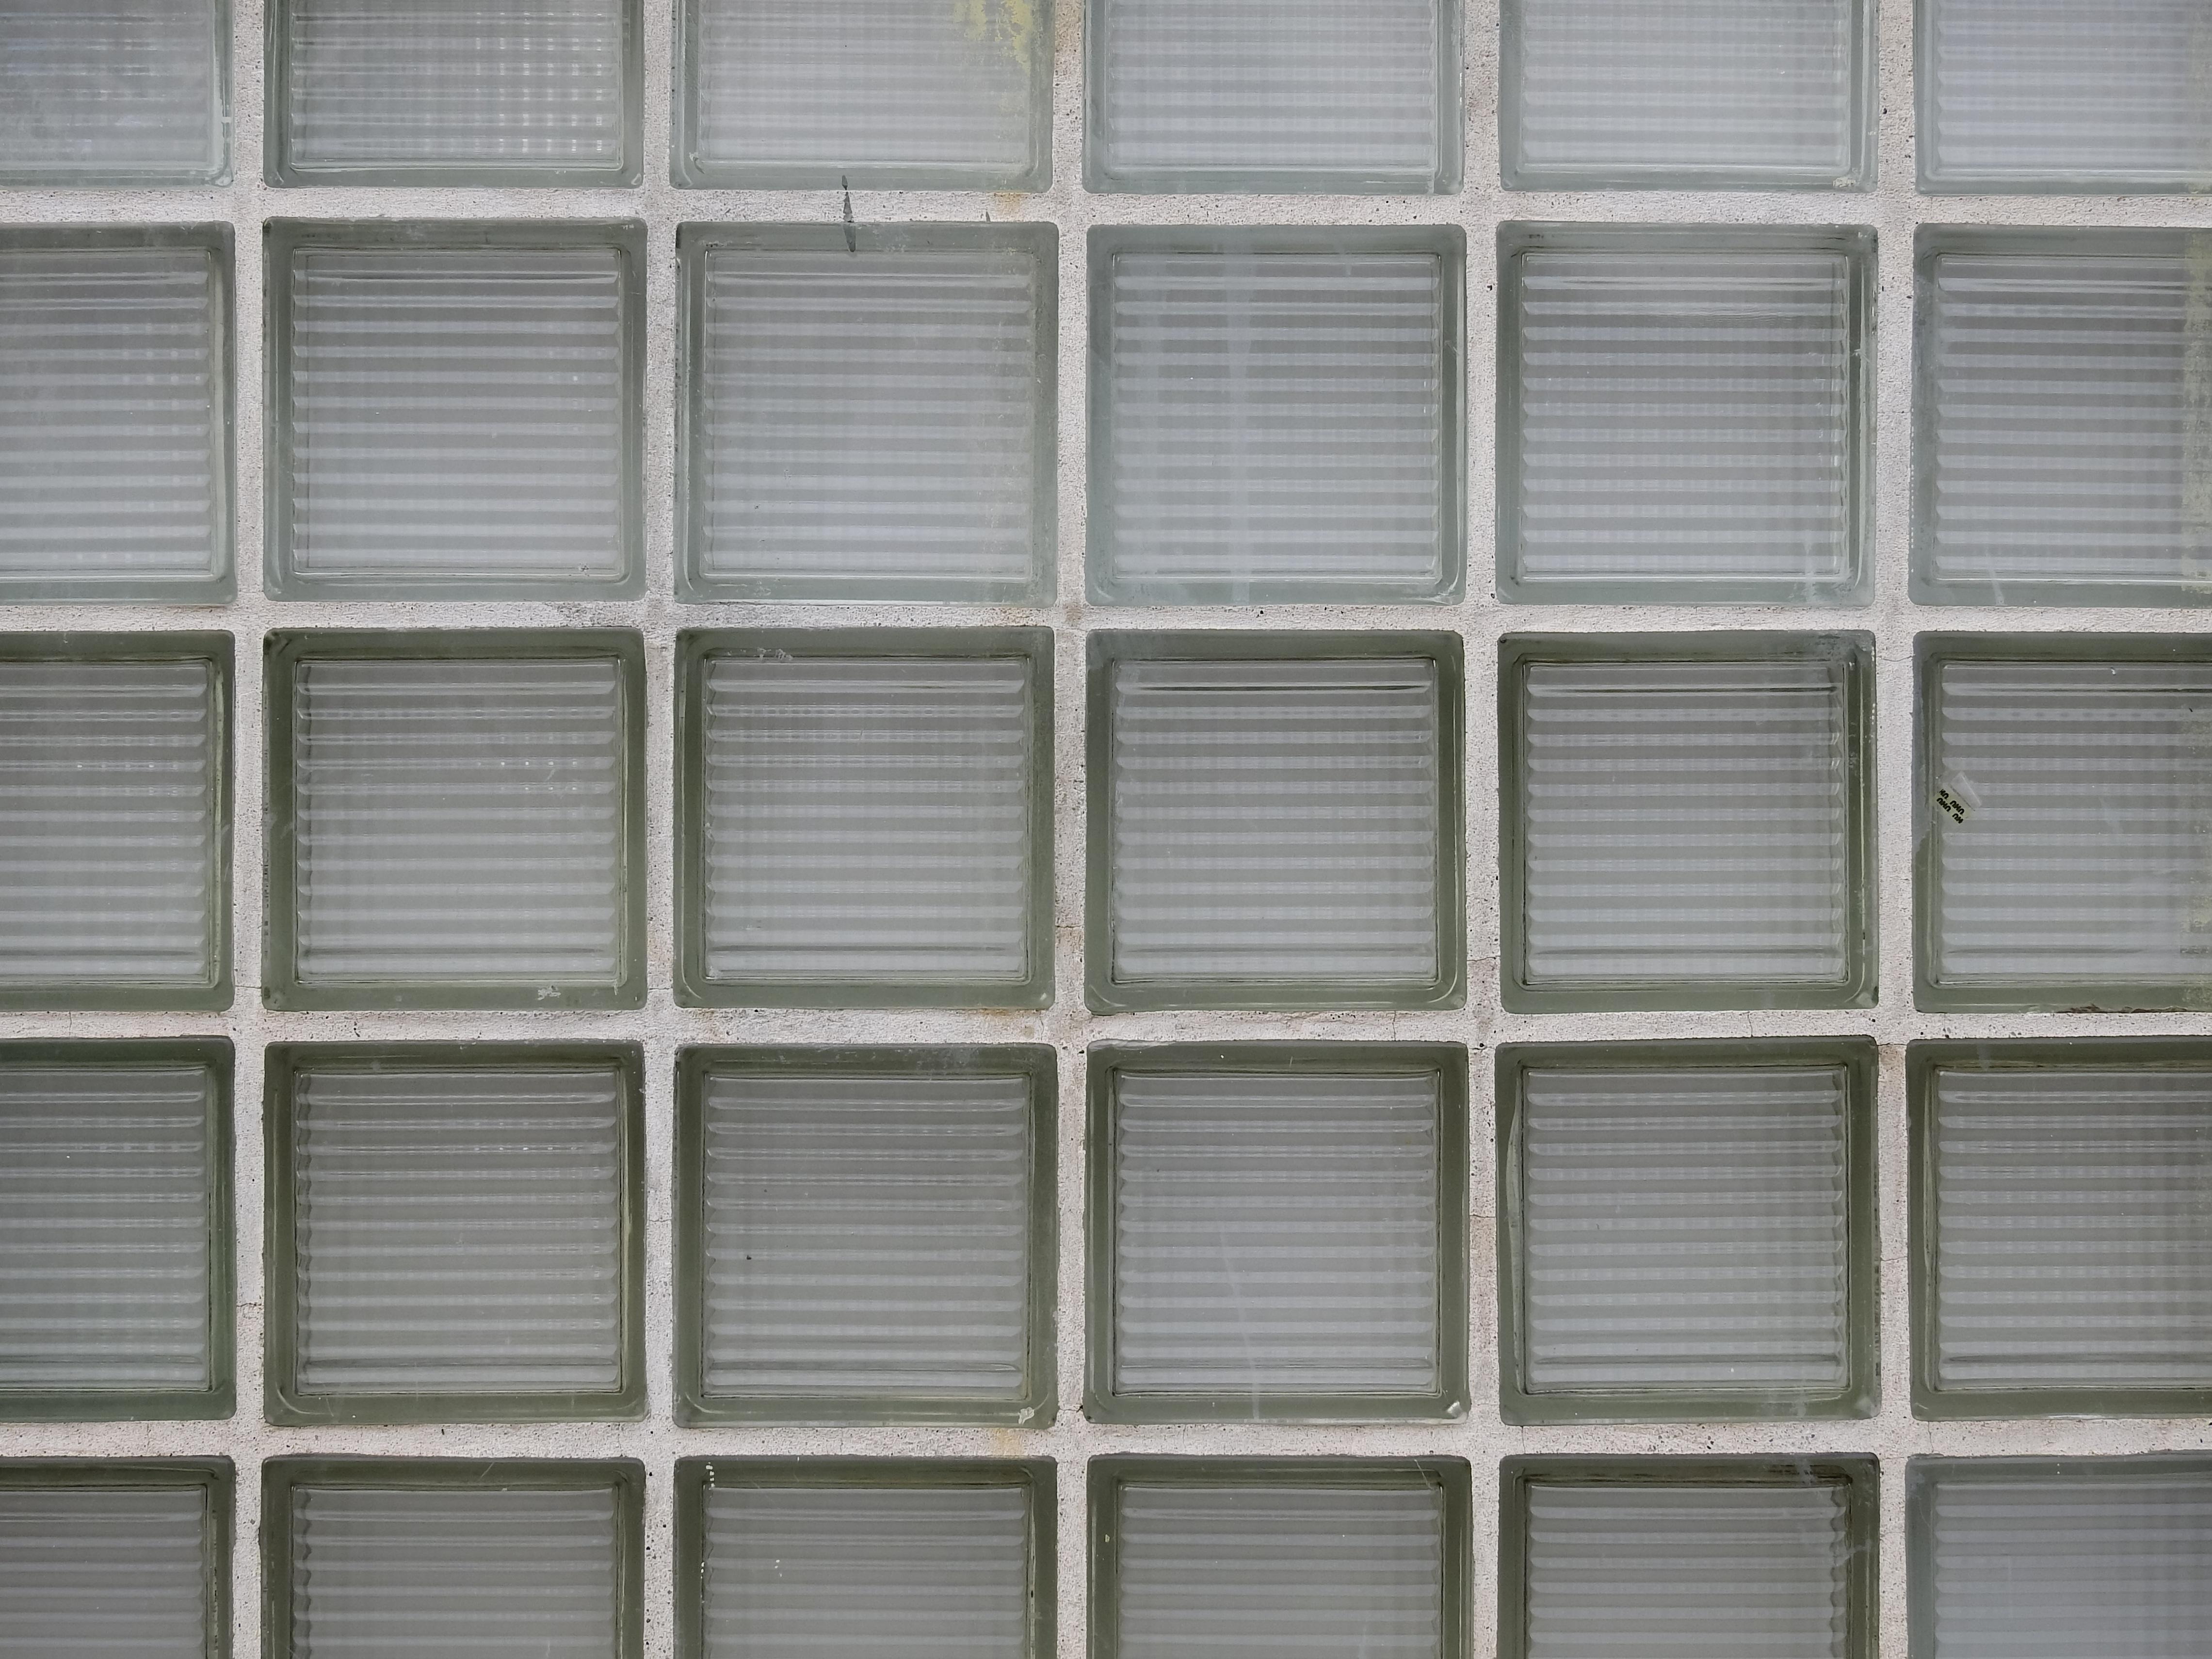 Wood Texture Floor Window Glass Wall Line Facade Tile Material Interior Design Background Wallpaper Blocks